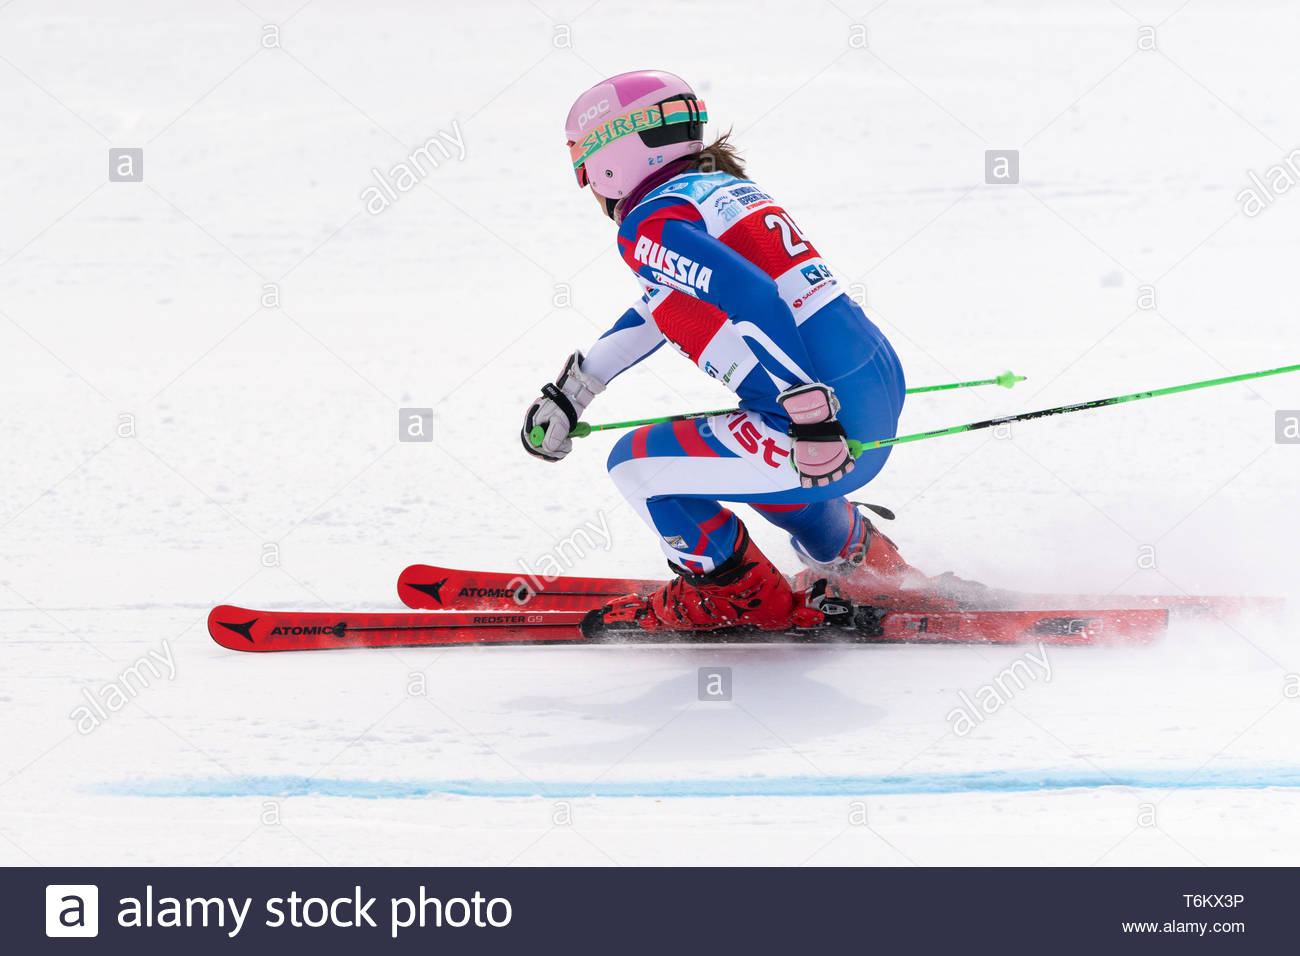 KAMCHATKA, RUSSIA - APR 2, 2019: International Ski Federation Championship, Russian Women's Alpine Skiing Cup, giant slalom. Mountain skier Girina Vit - Stock Image